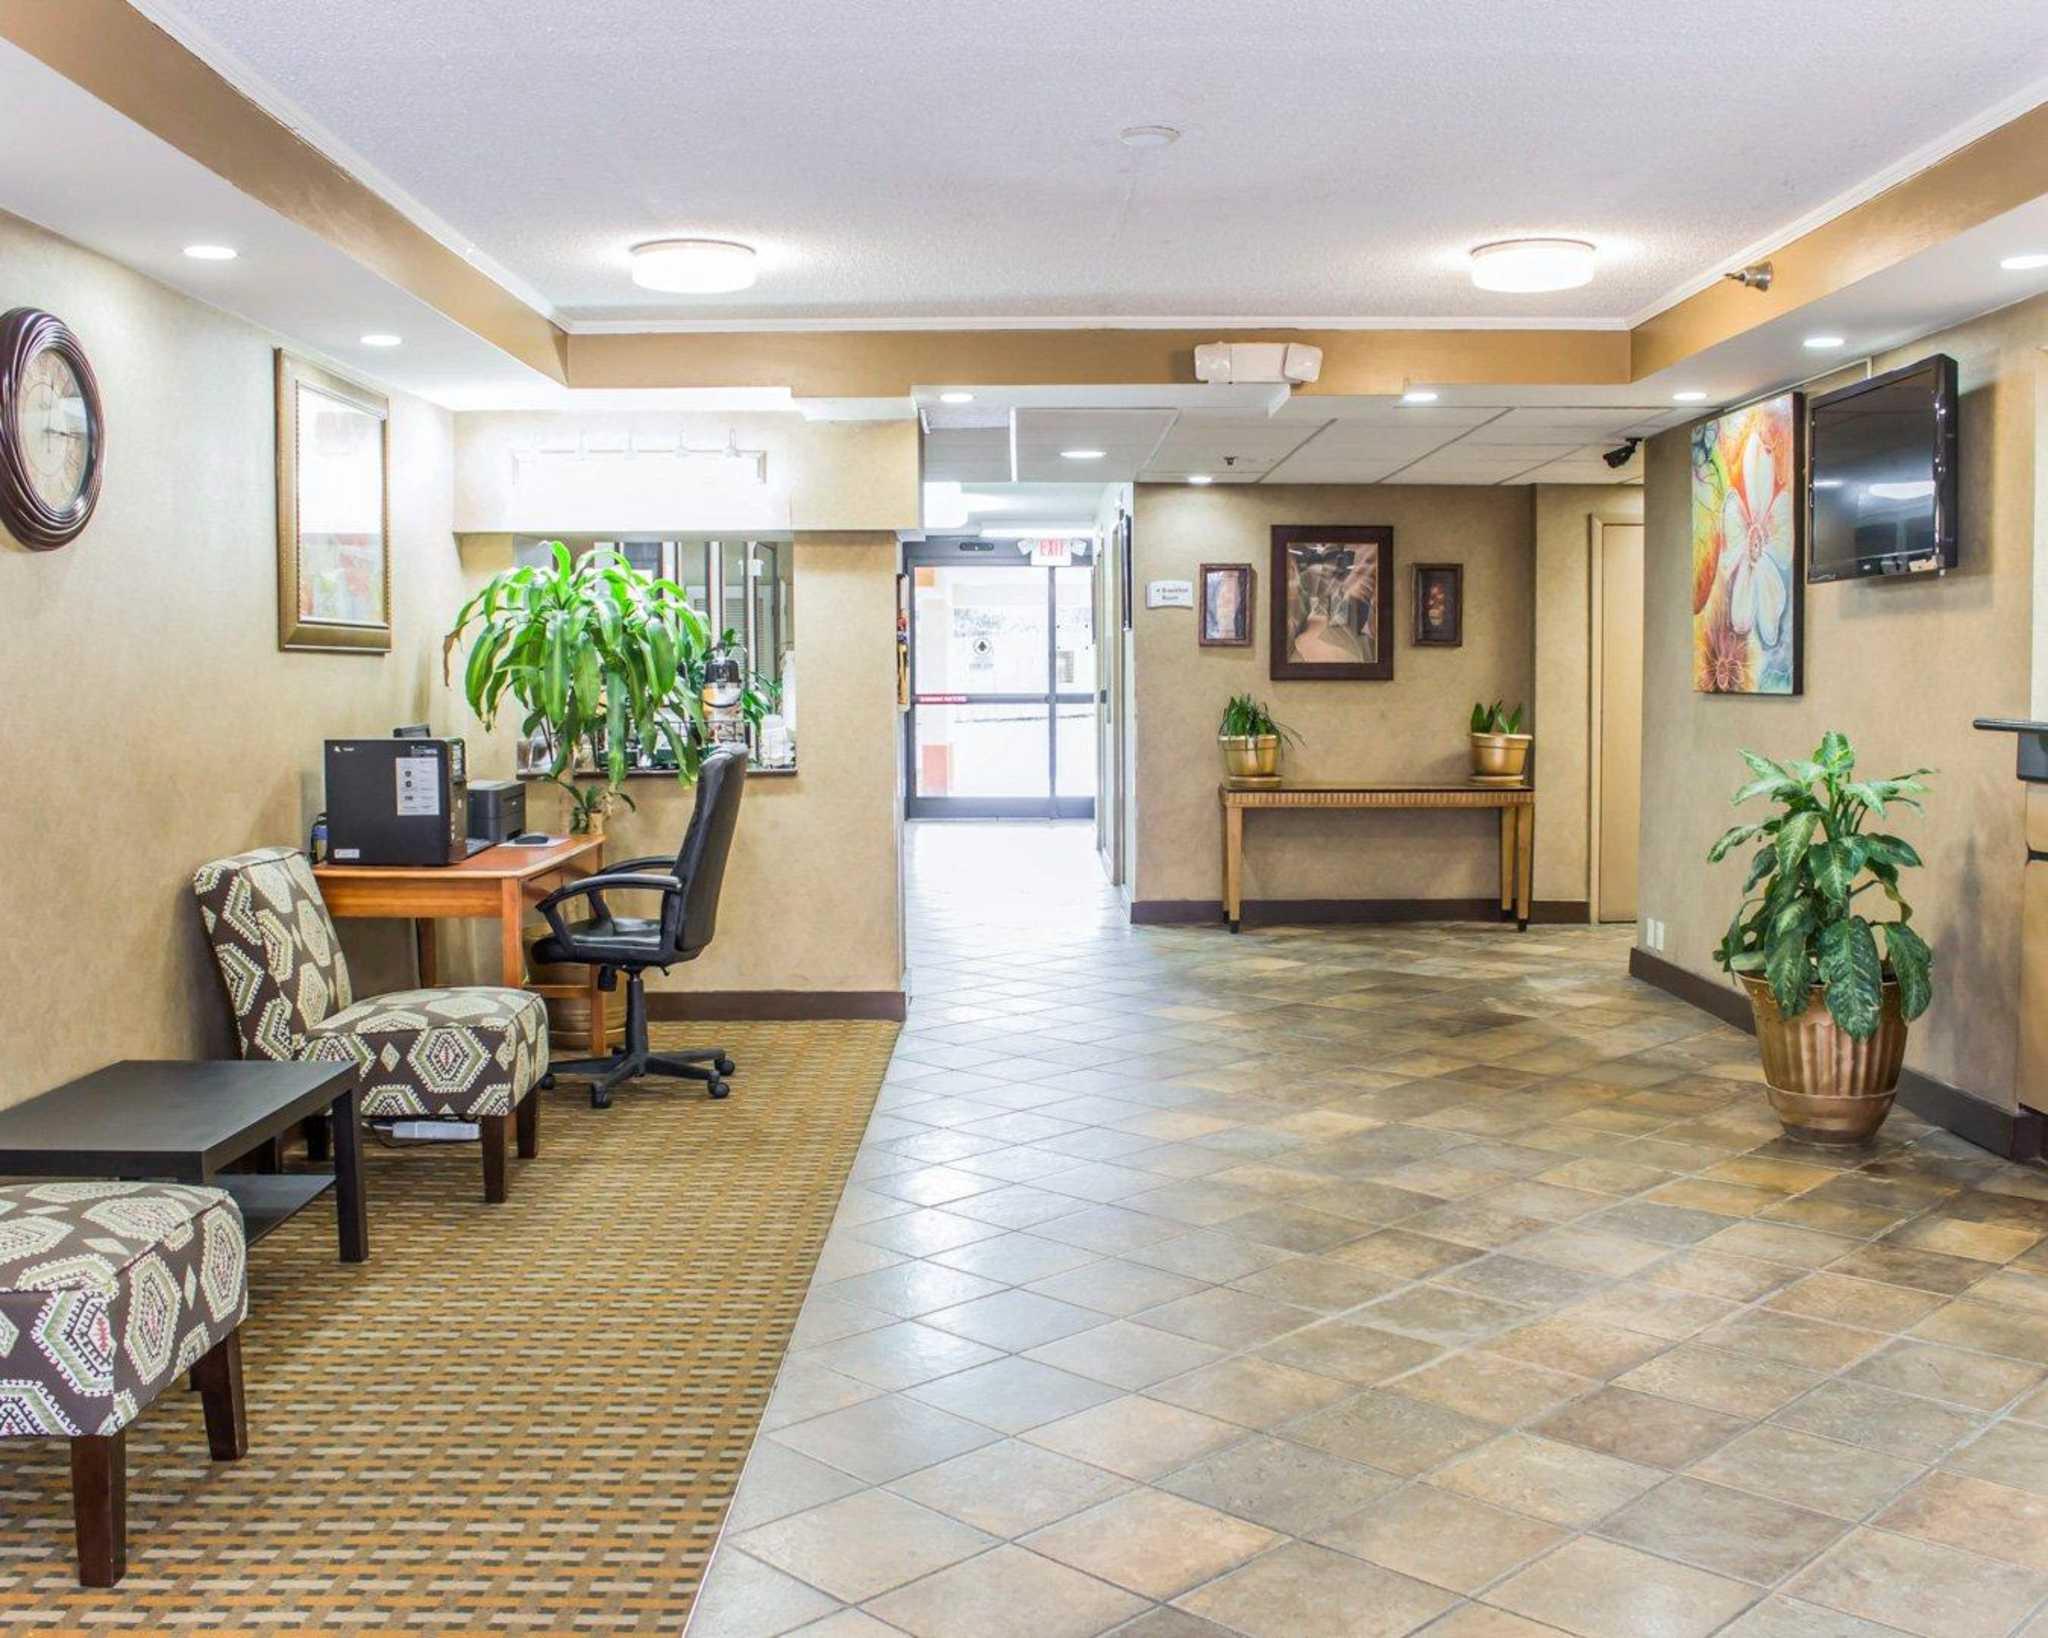 Quality Inn & Suites Fort Bragg image 11